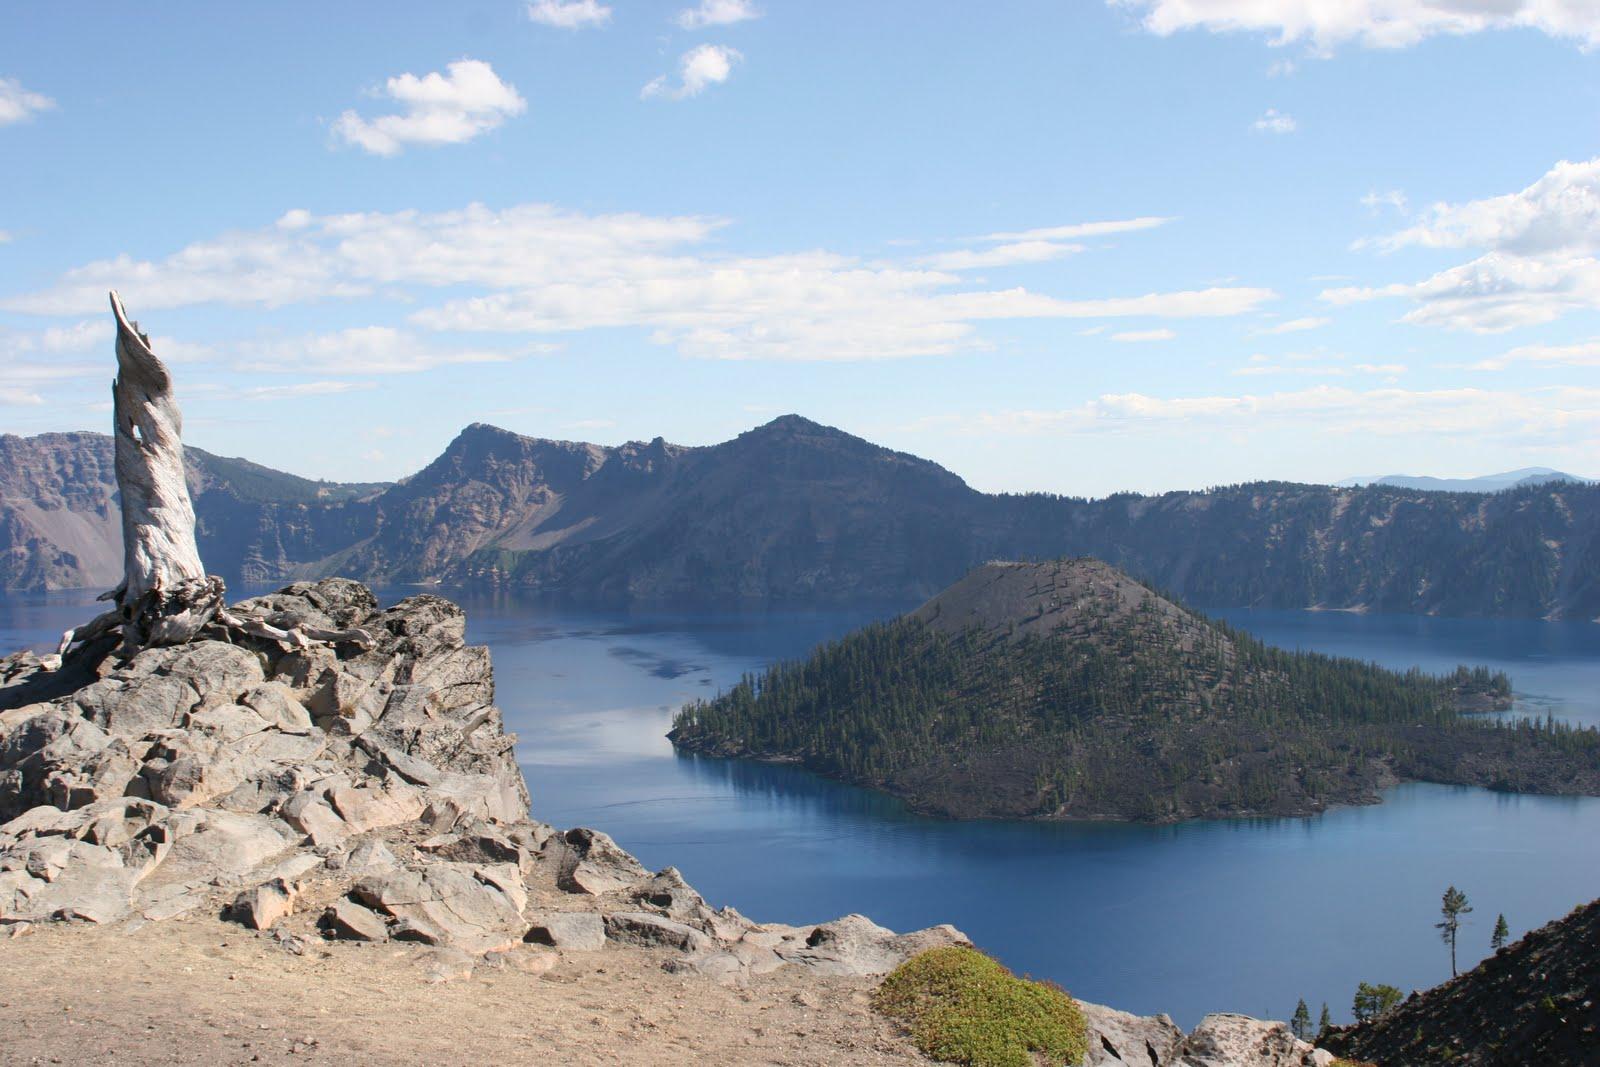 [Crater+Lake+National+Park+(9).JPG]